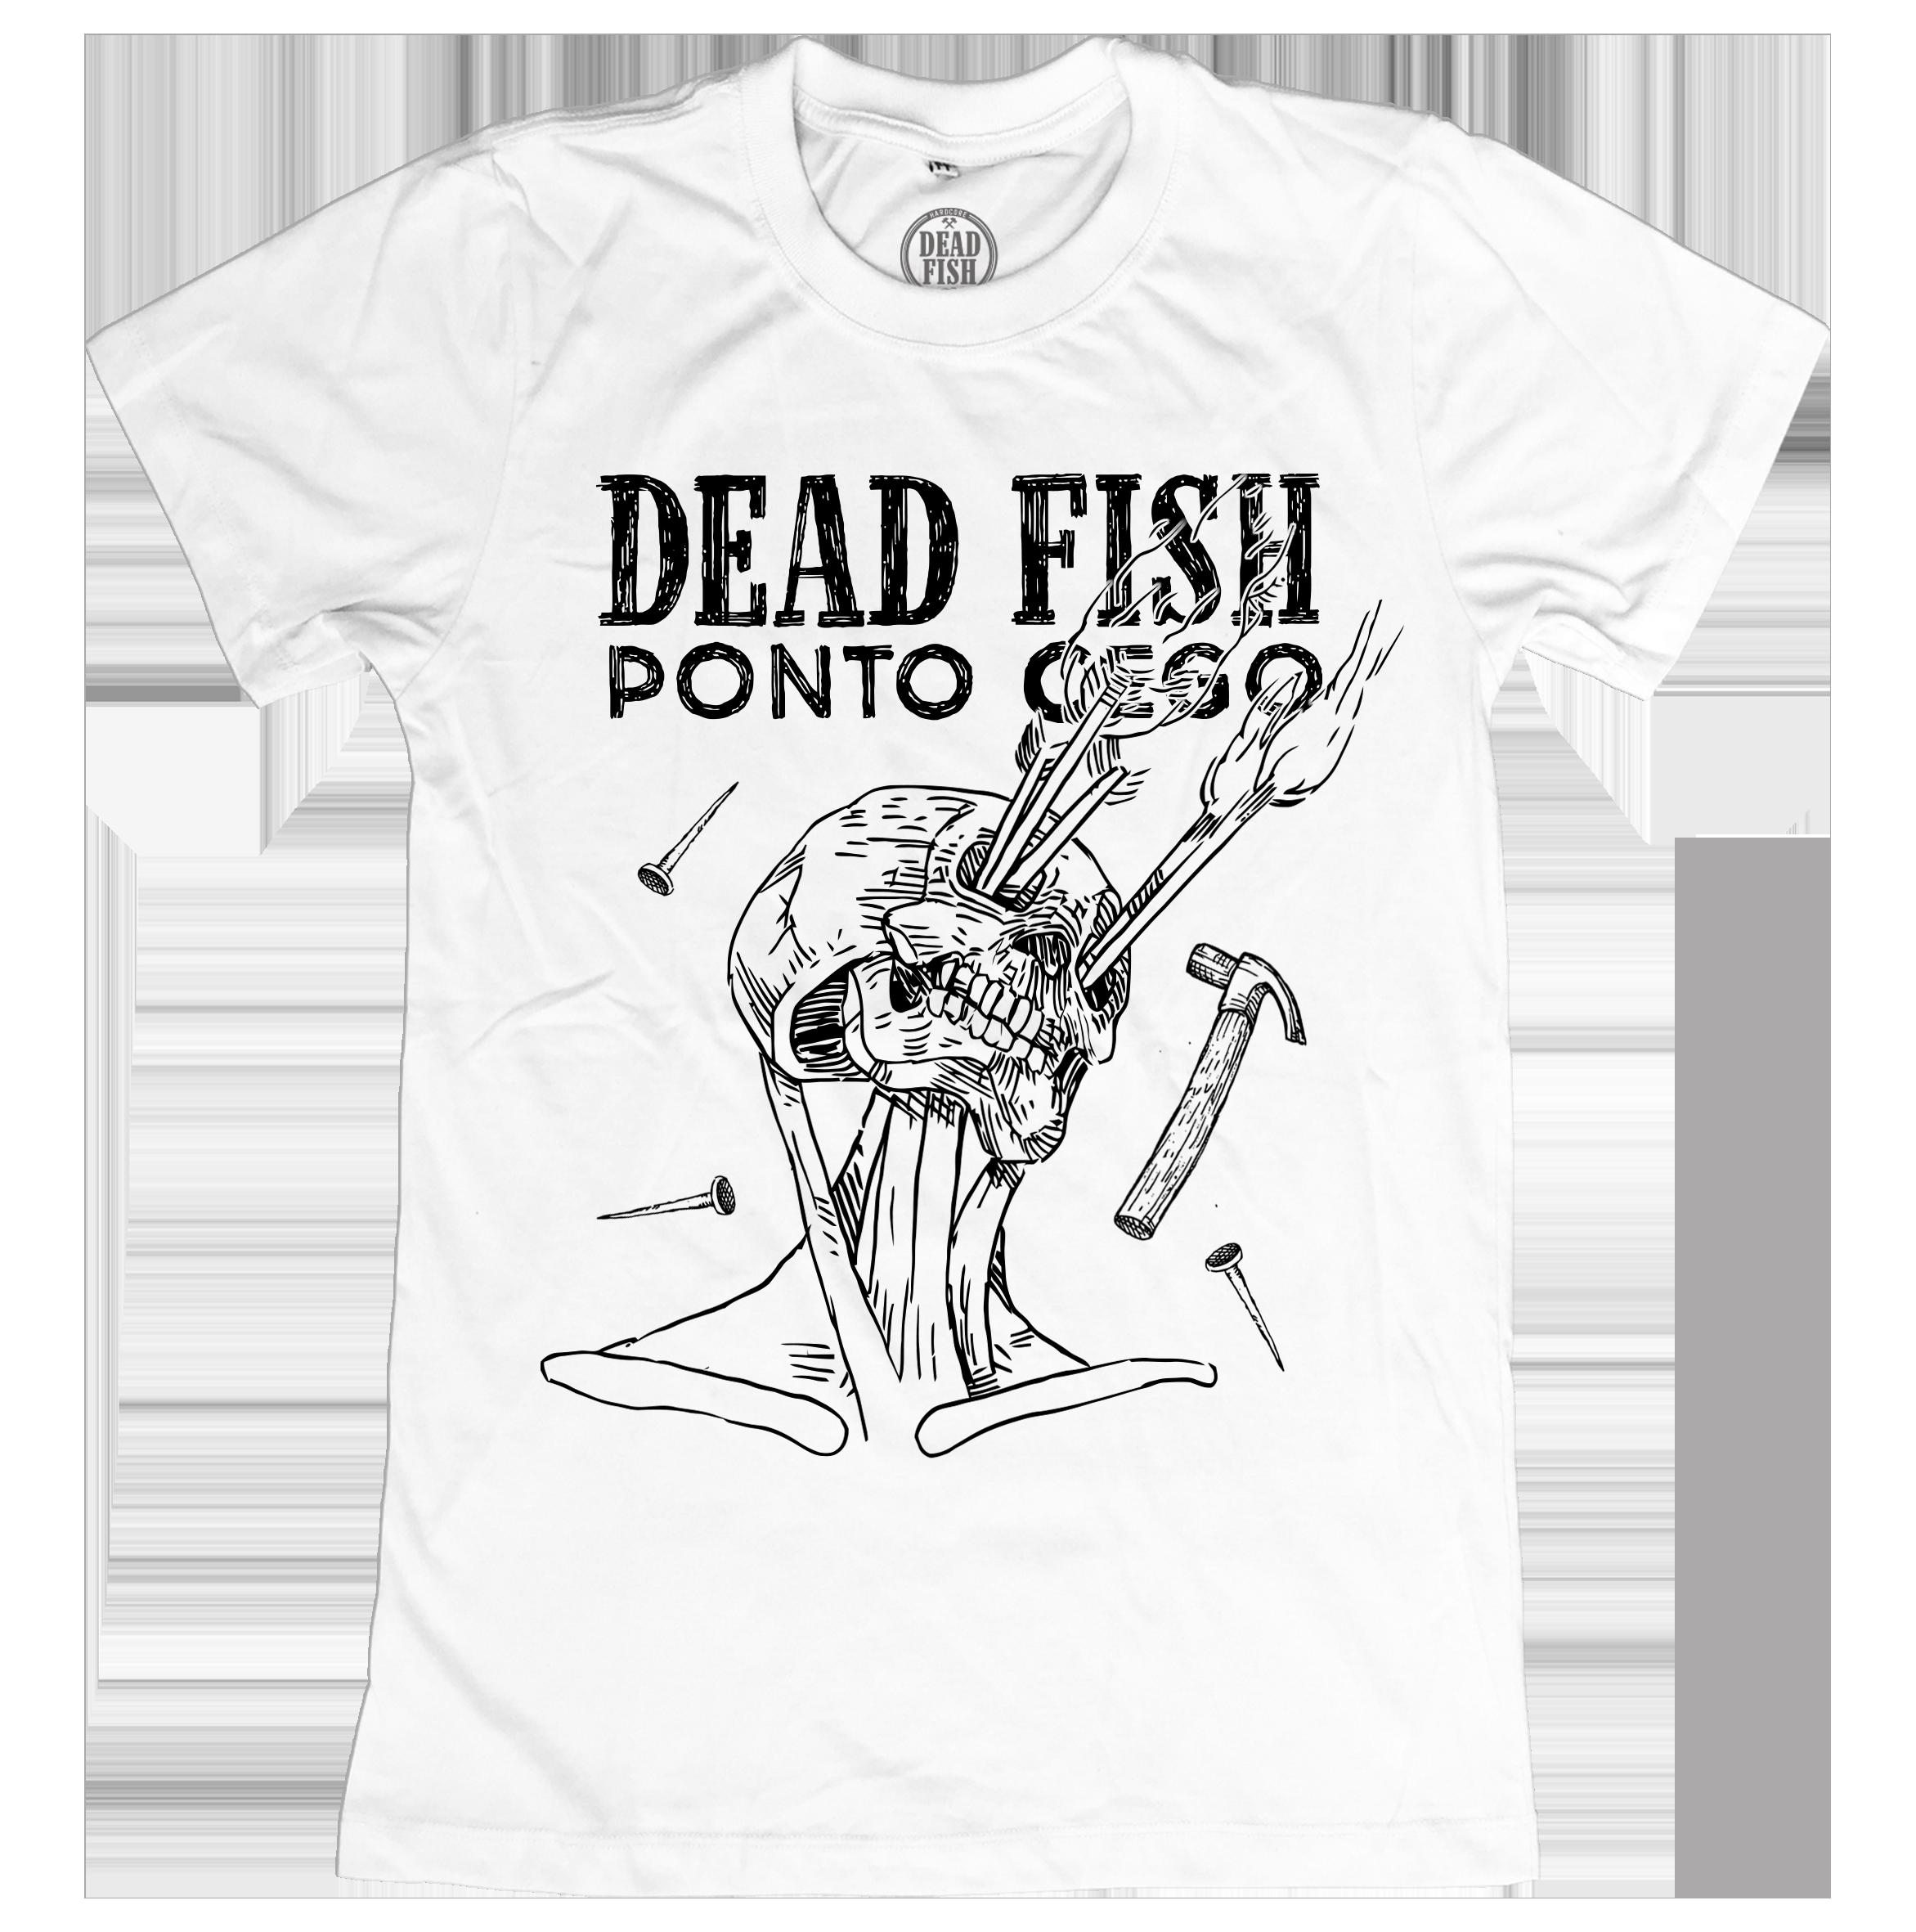 Dead Fish - Ponto Cego [Camiseta Branca]